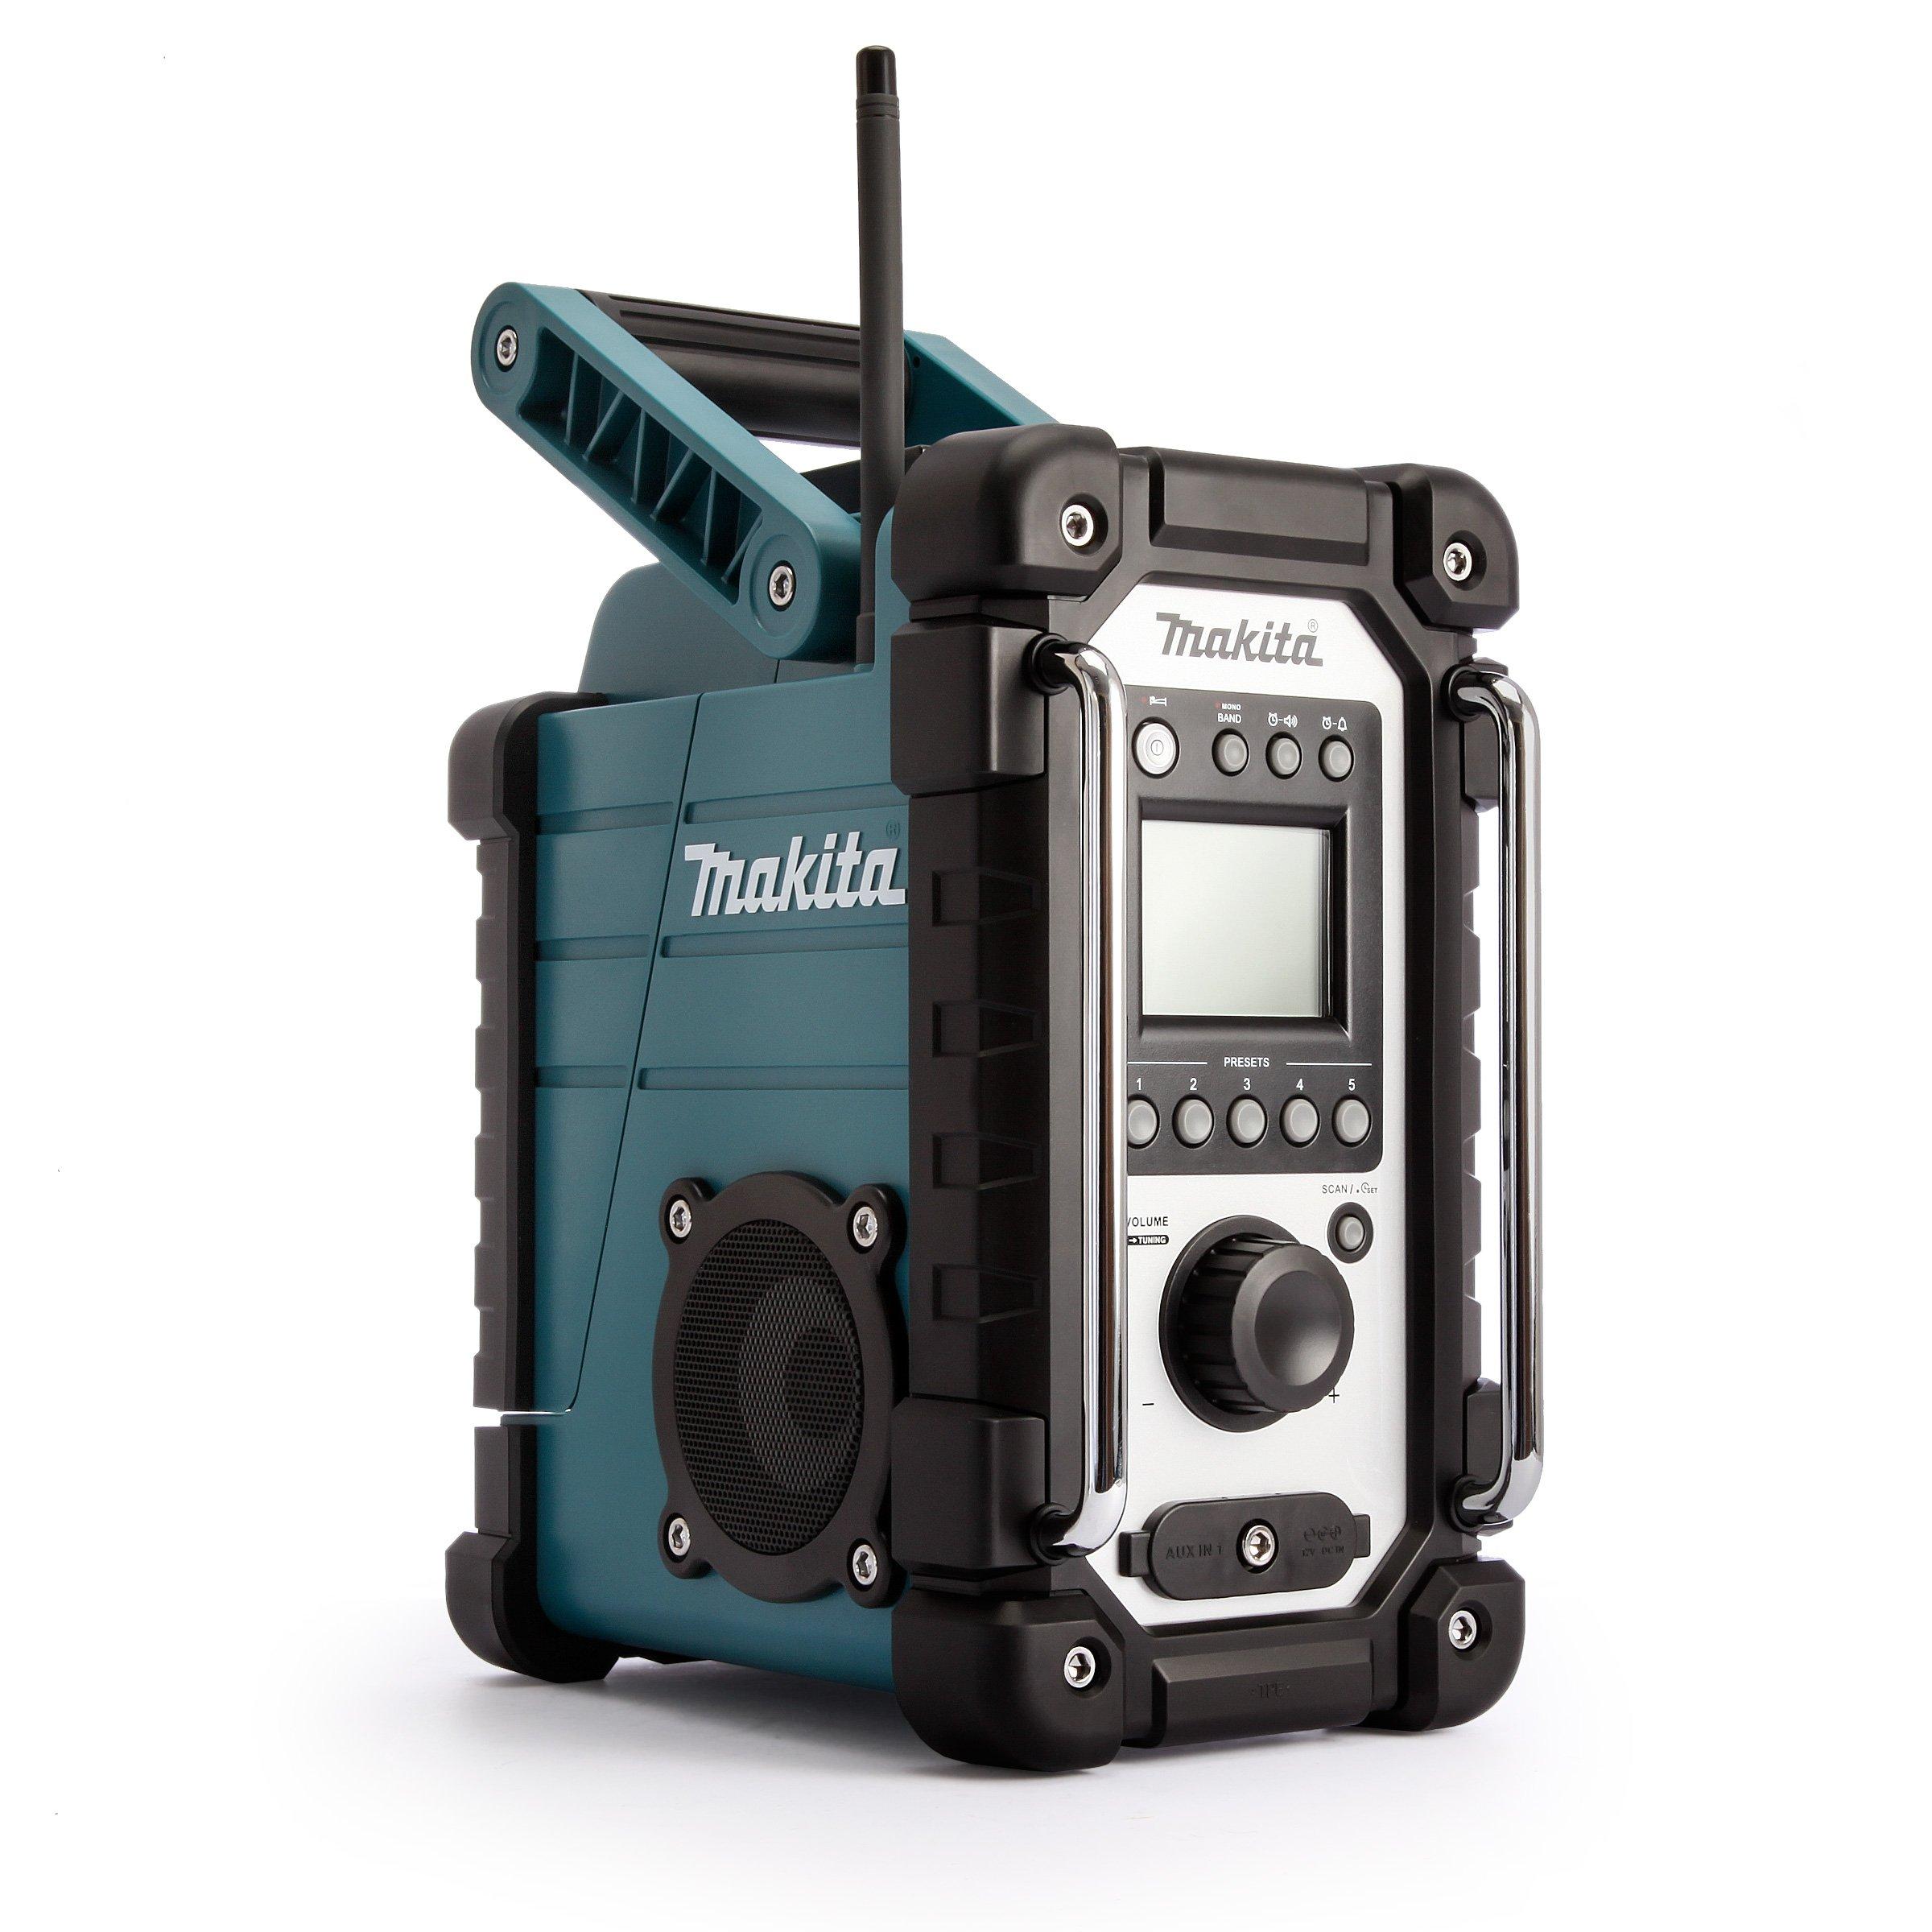 Makita DMR107 Baustellenradio 7,2 – 18 Volt, ohne Akku